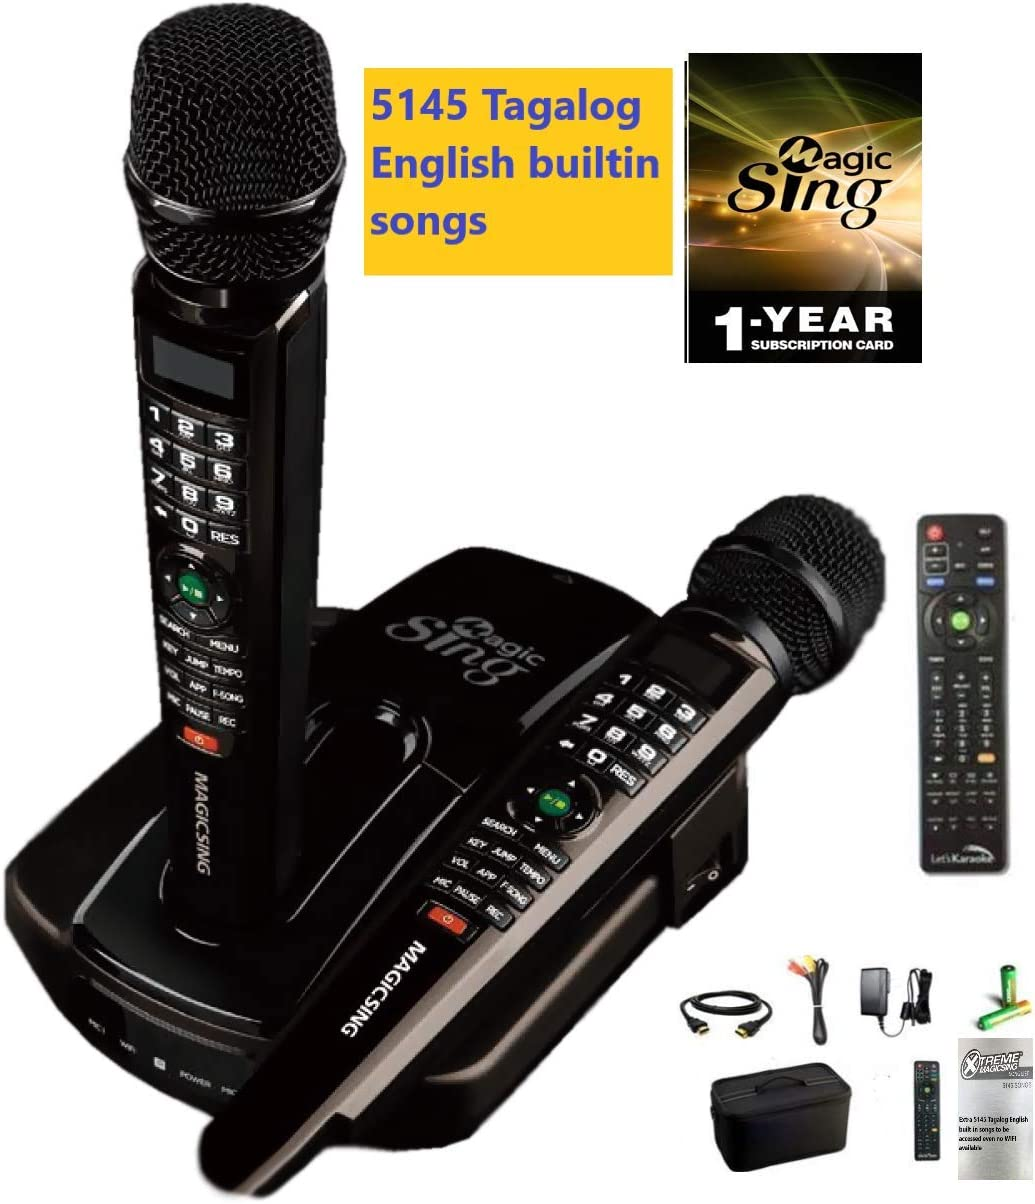 2019 Et23Pro Wifi Magic Sing Karaoke zwei Wireless Mics 12,000 English +1 Jahr Subscription für Tagalog Hindi Spanish Russian Vietnamese Japanese Korean Songs & More